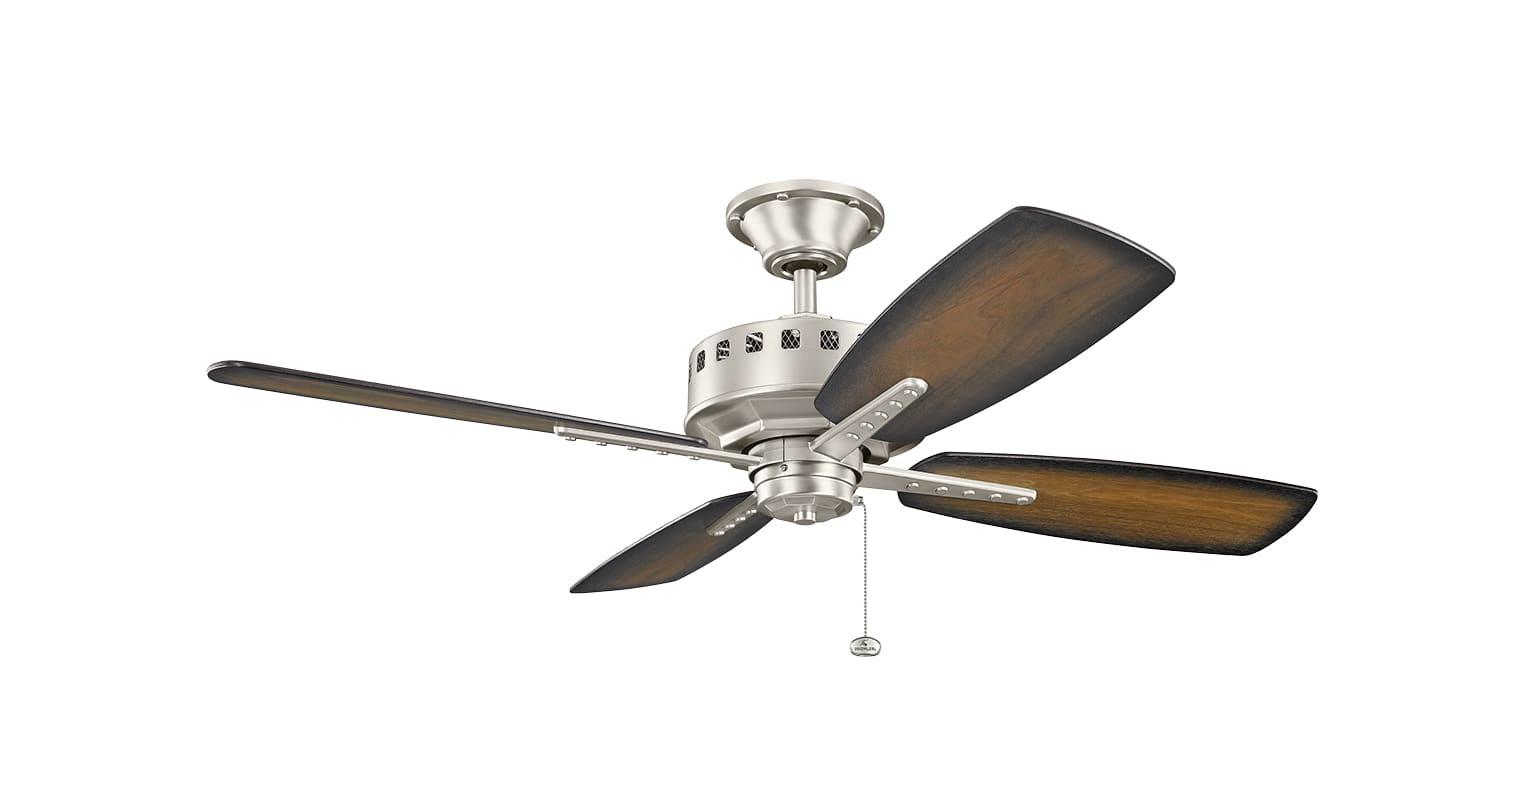 Kichler 310135ni Brushed Nickel 52 Quot Indoor Ceiling Fan